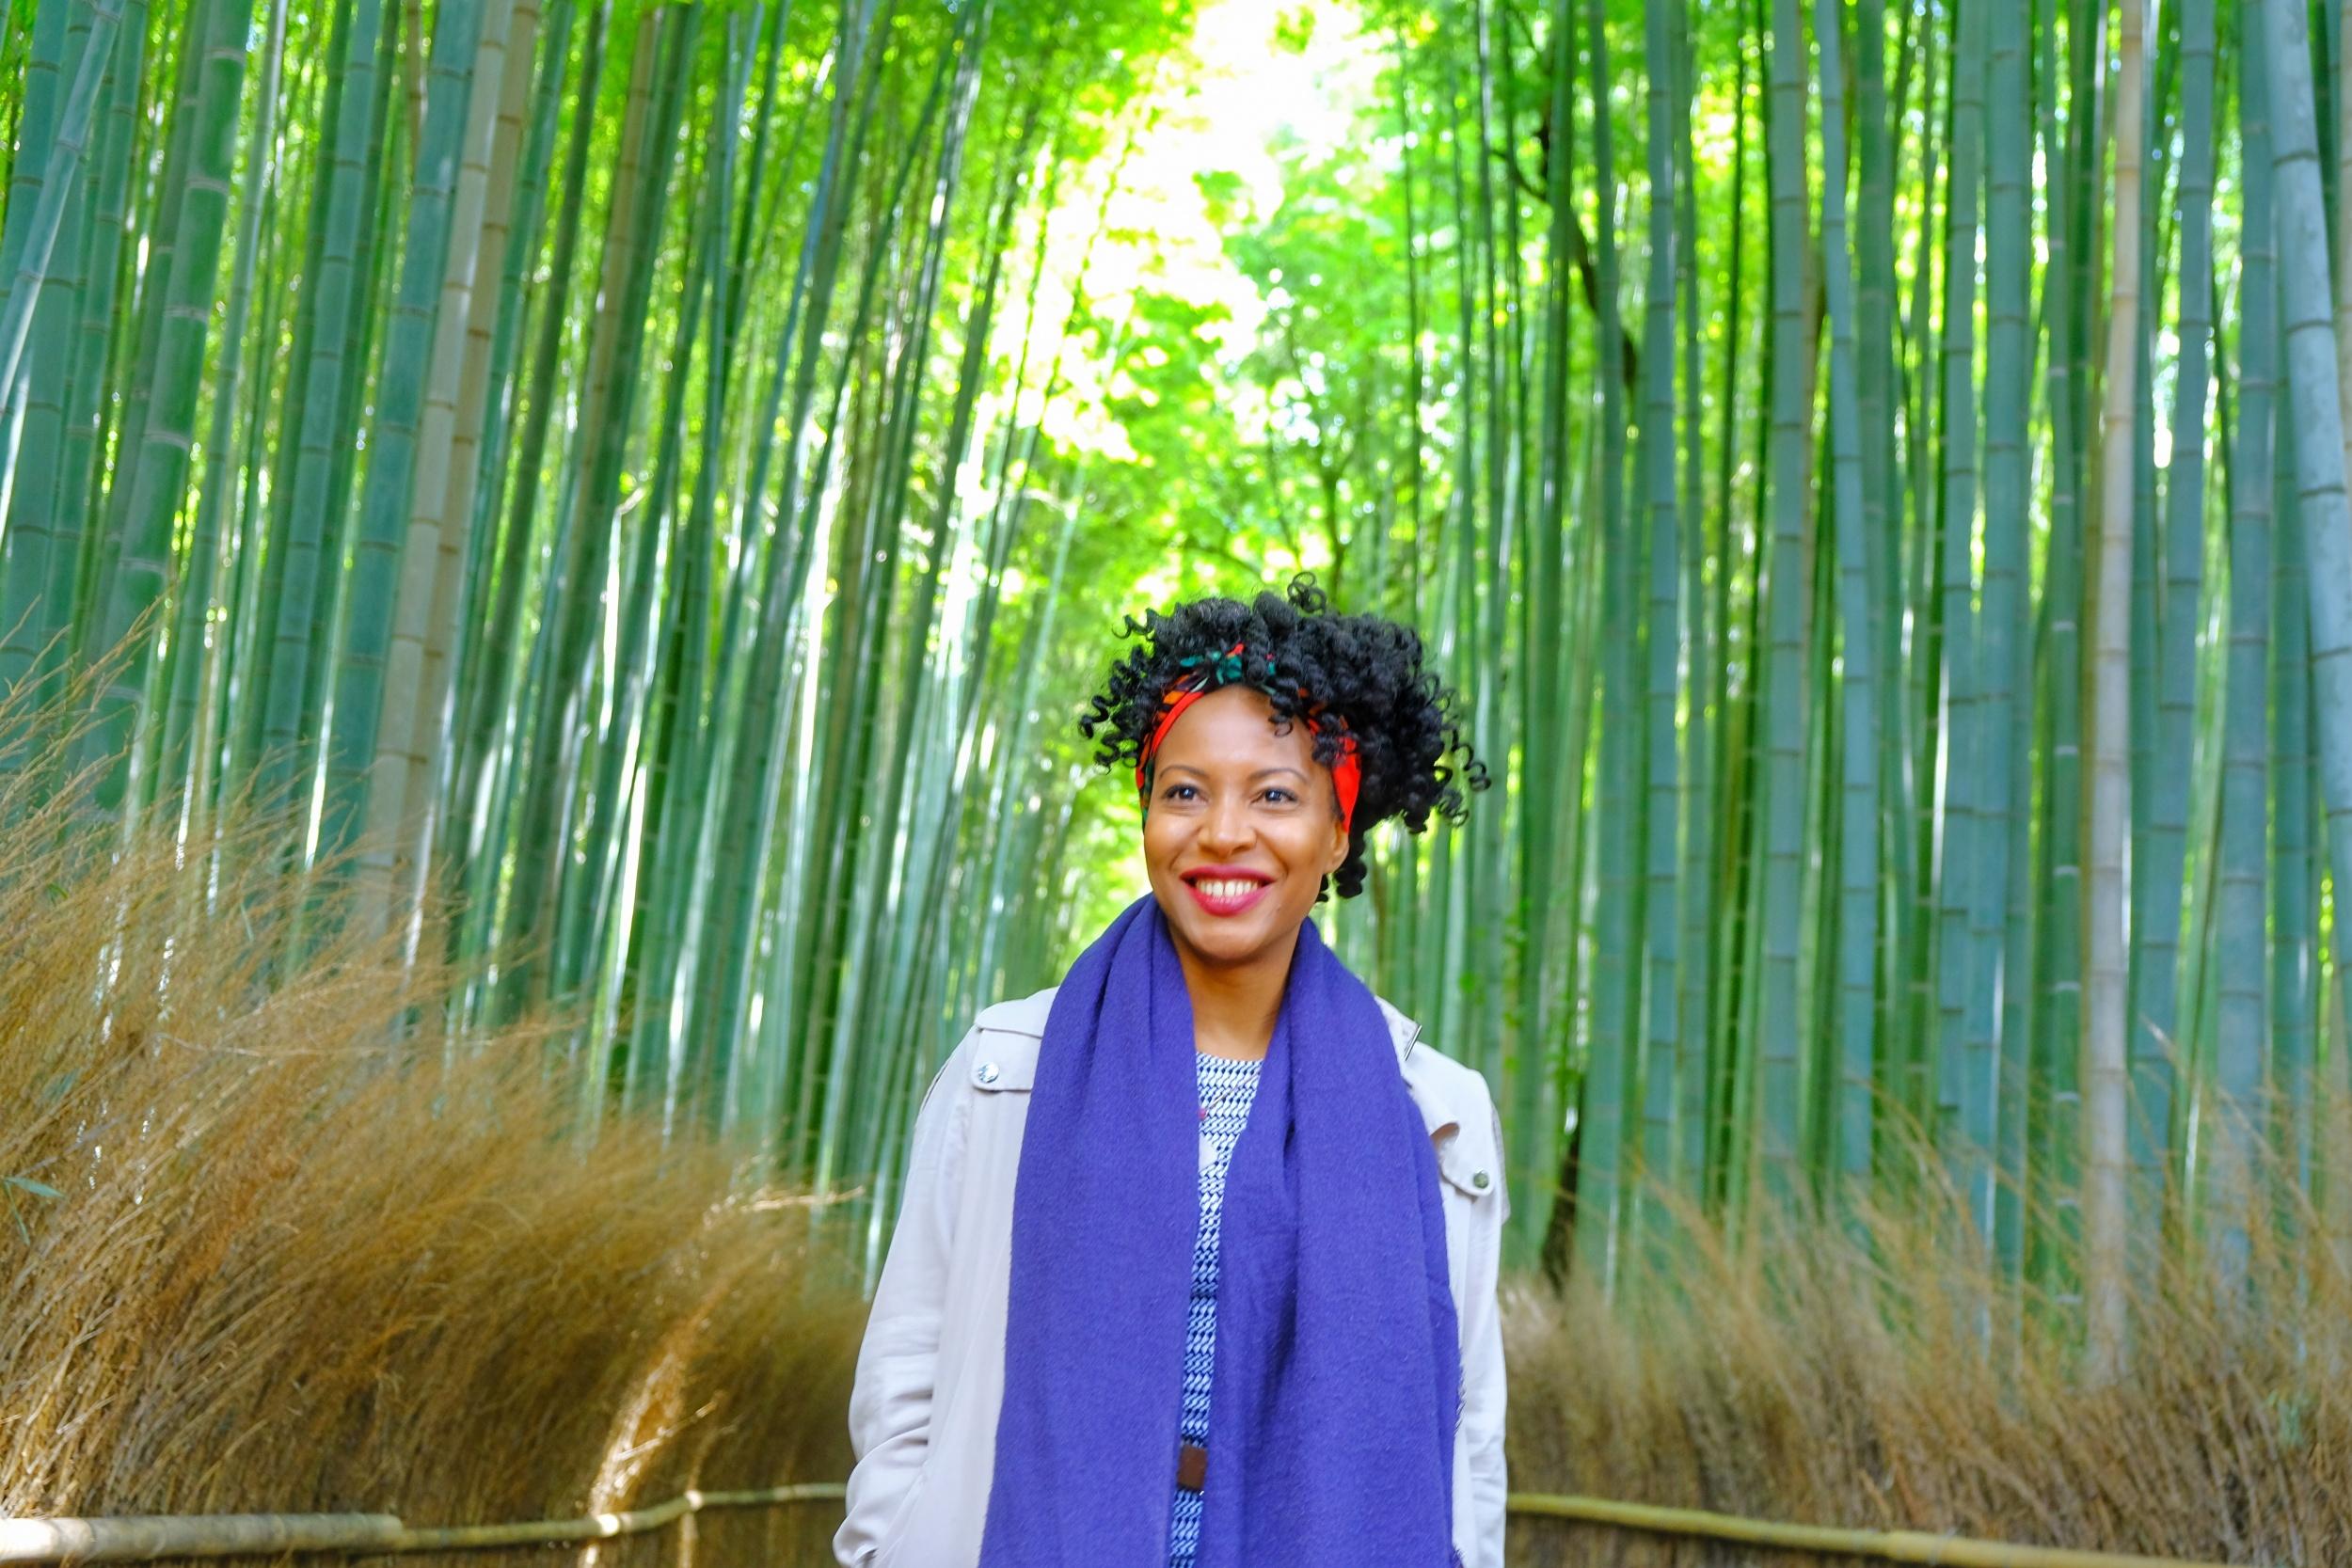 Bamboo Grove Kyoto - Post Office Travel Blogger Awards 2018